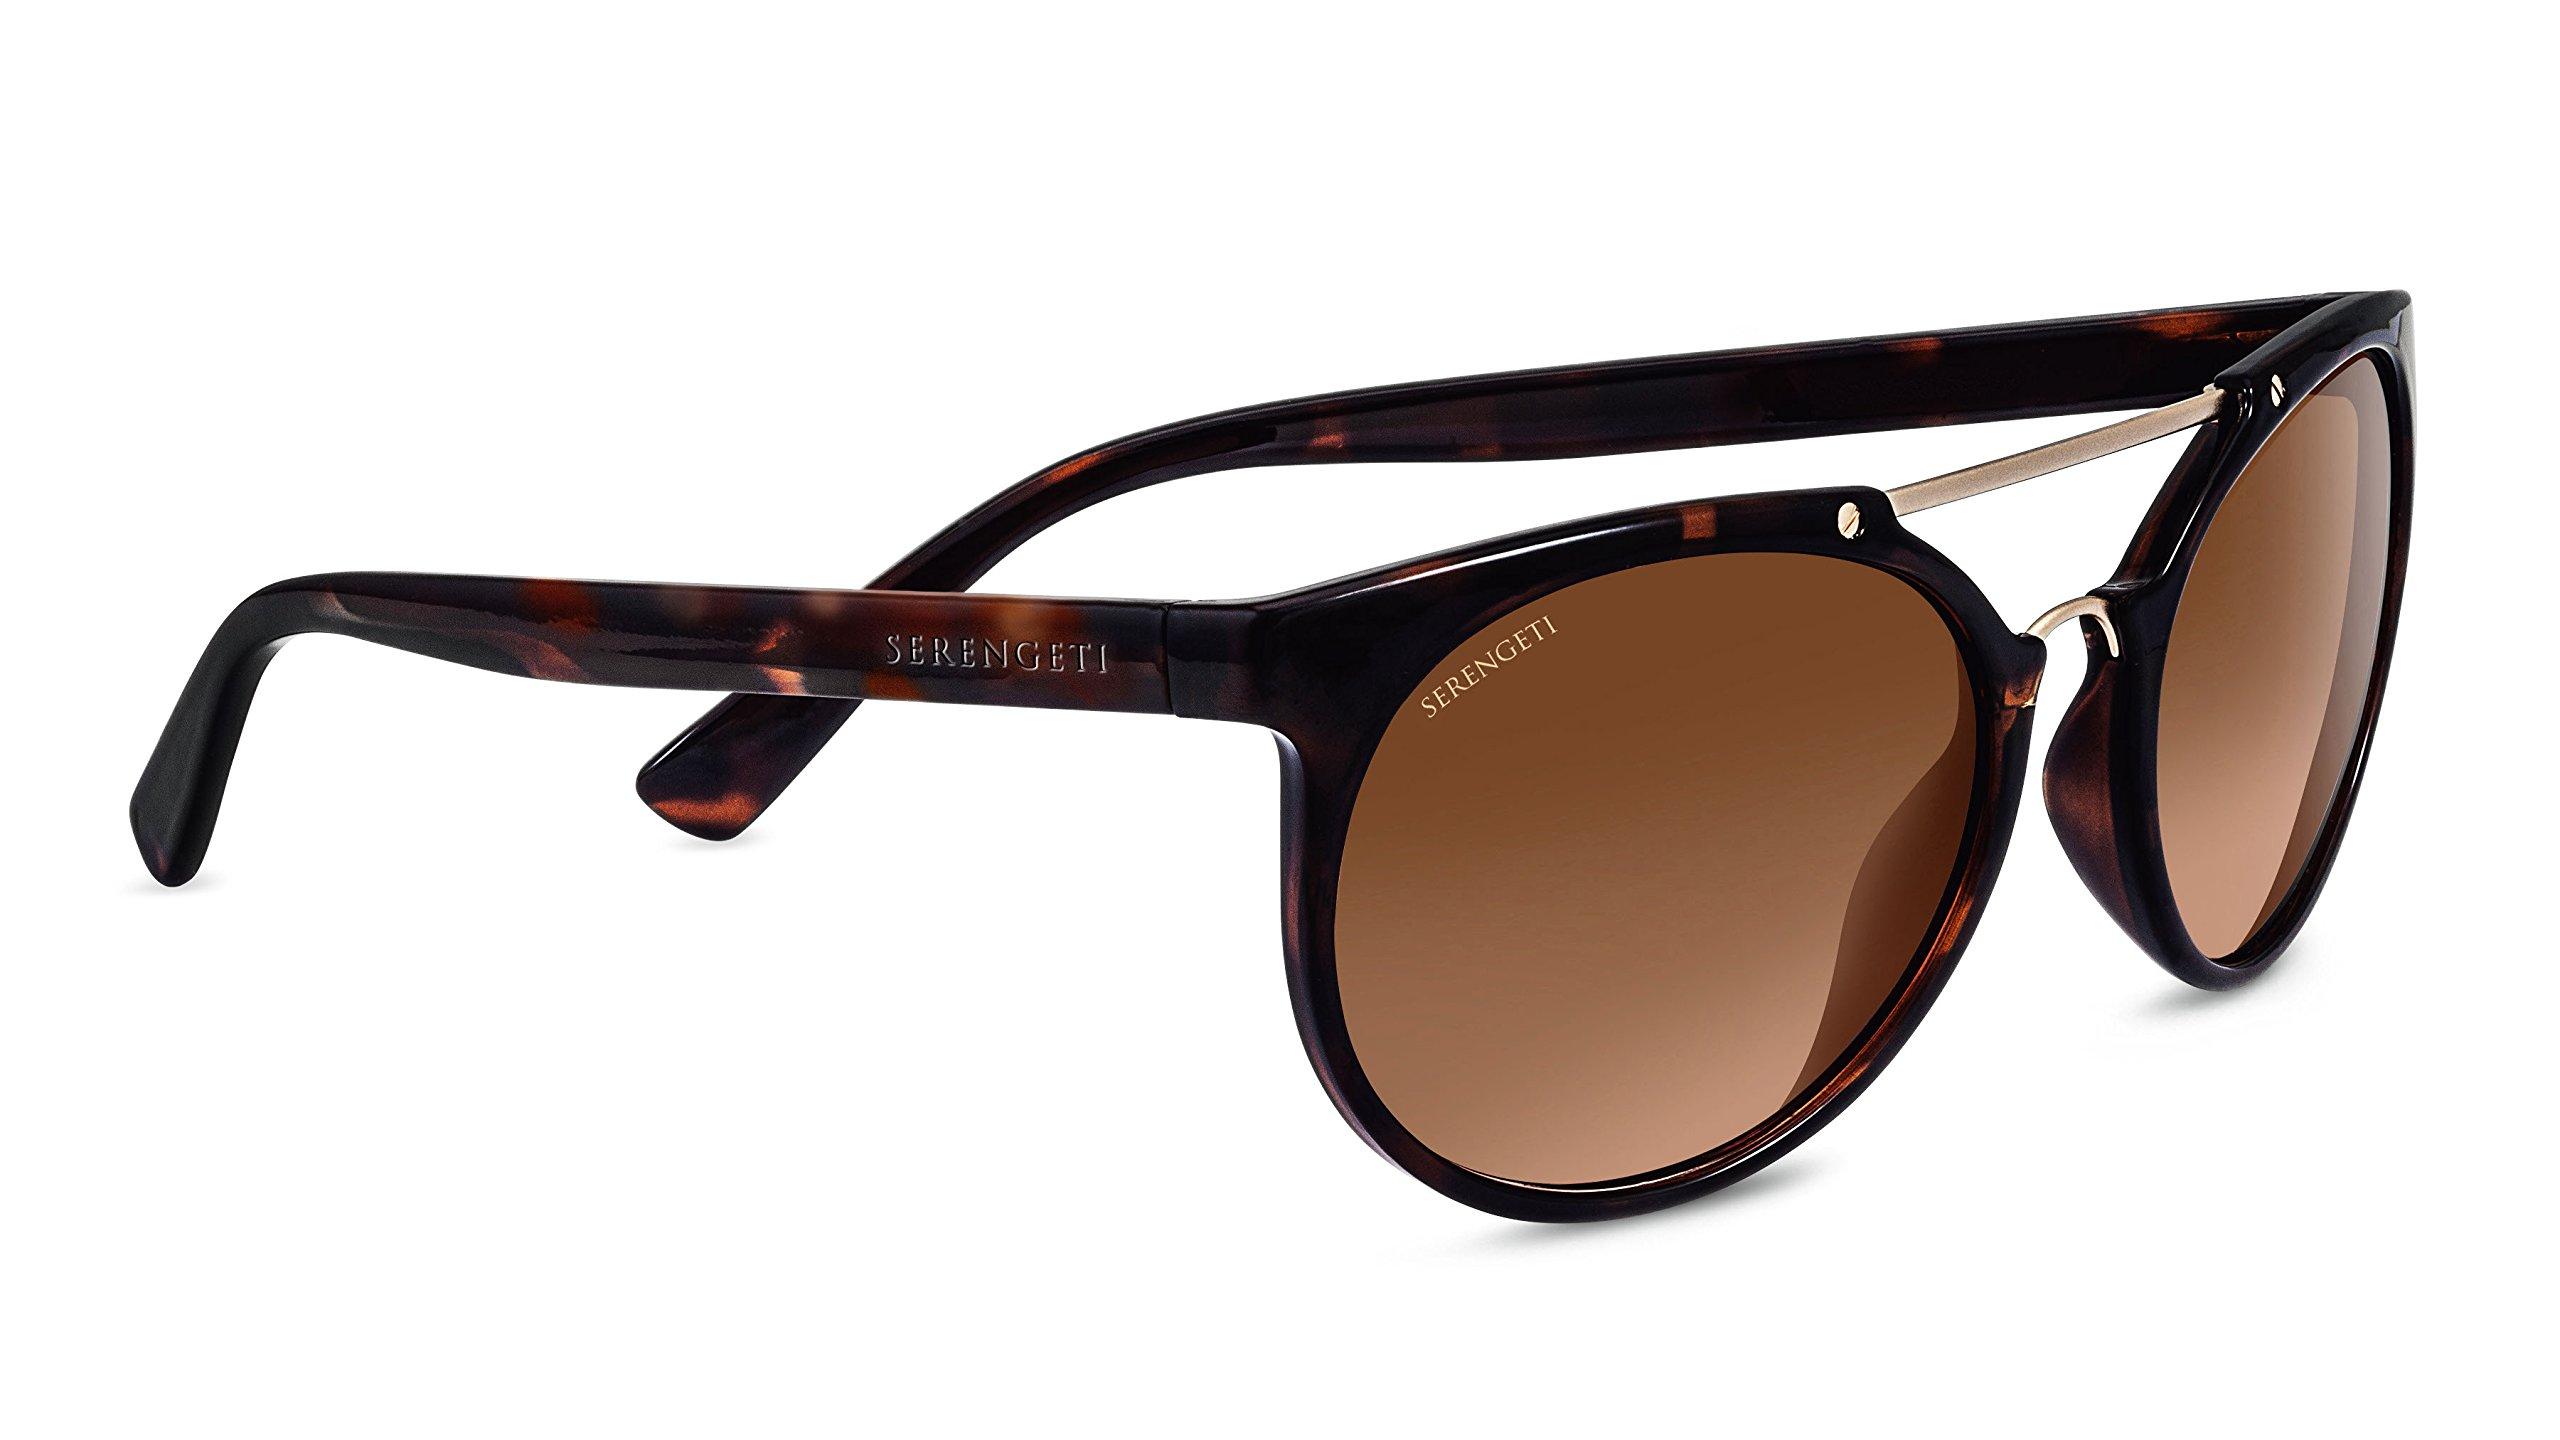 Serengeti 8352 Lerici Drivers Gradient Sunglasses, Shiny Tortoise Frame/Satin Soft Gold by Serengeti (Image #1)